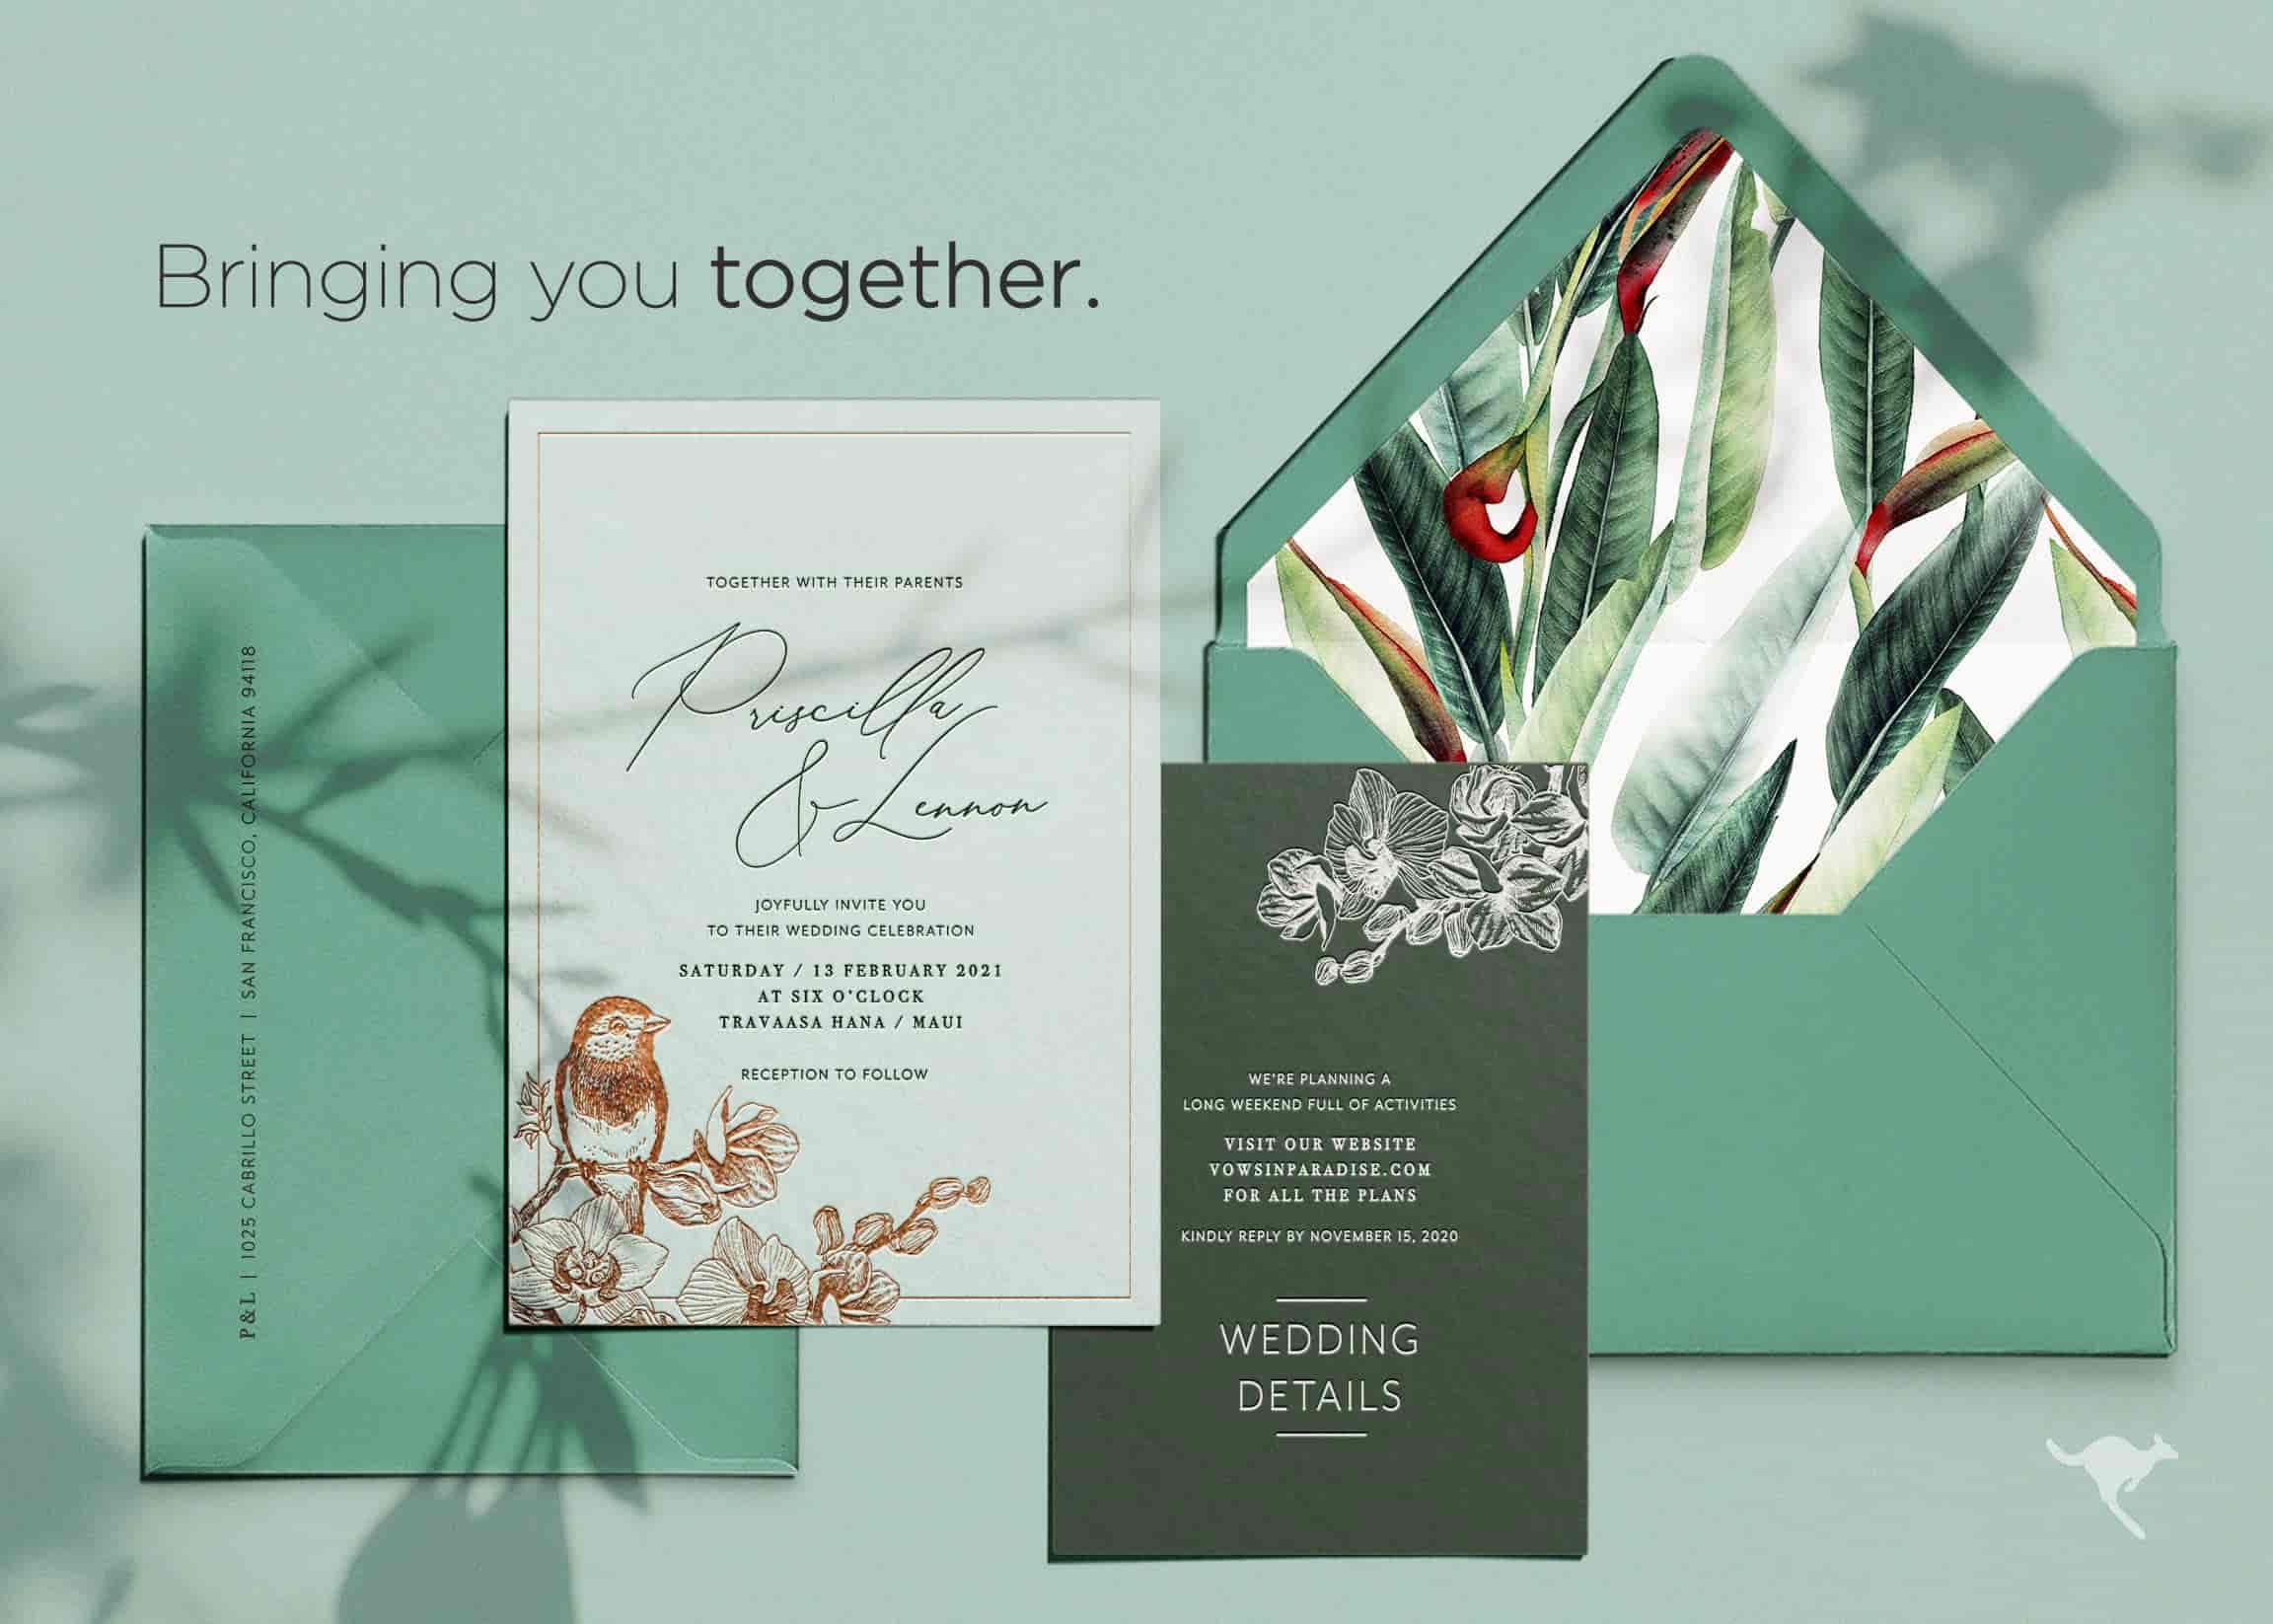 invitations image